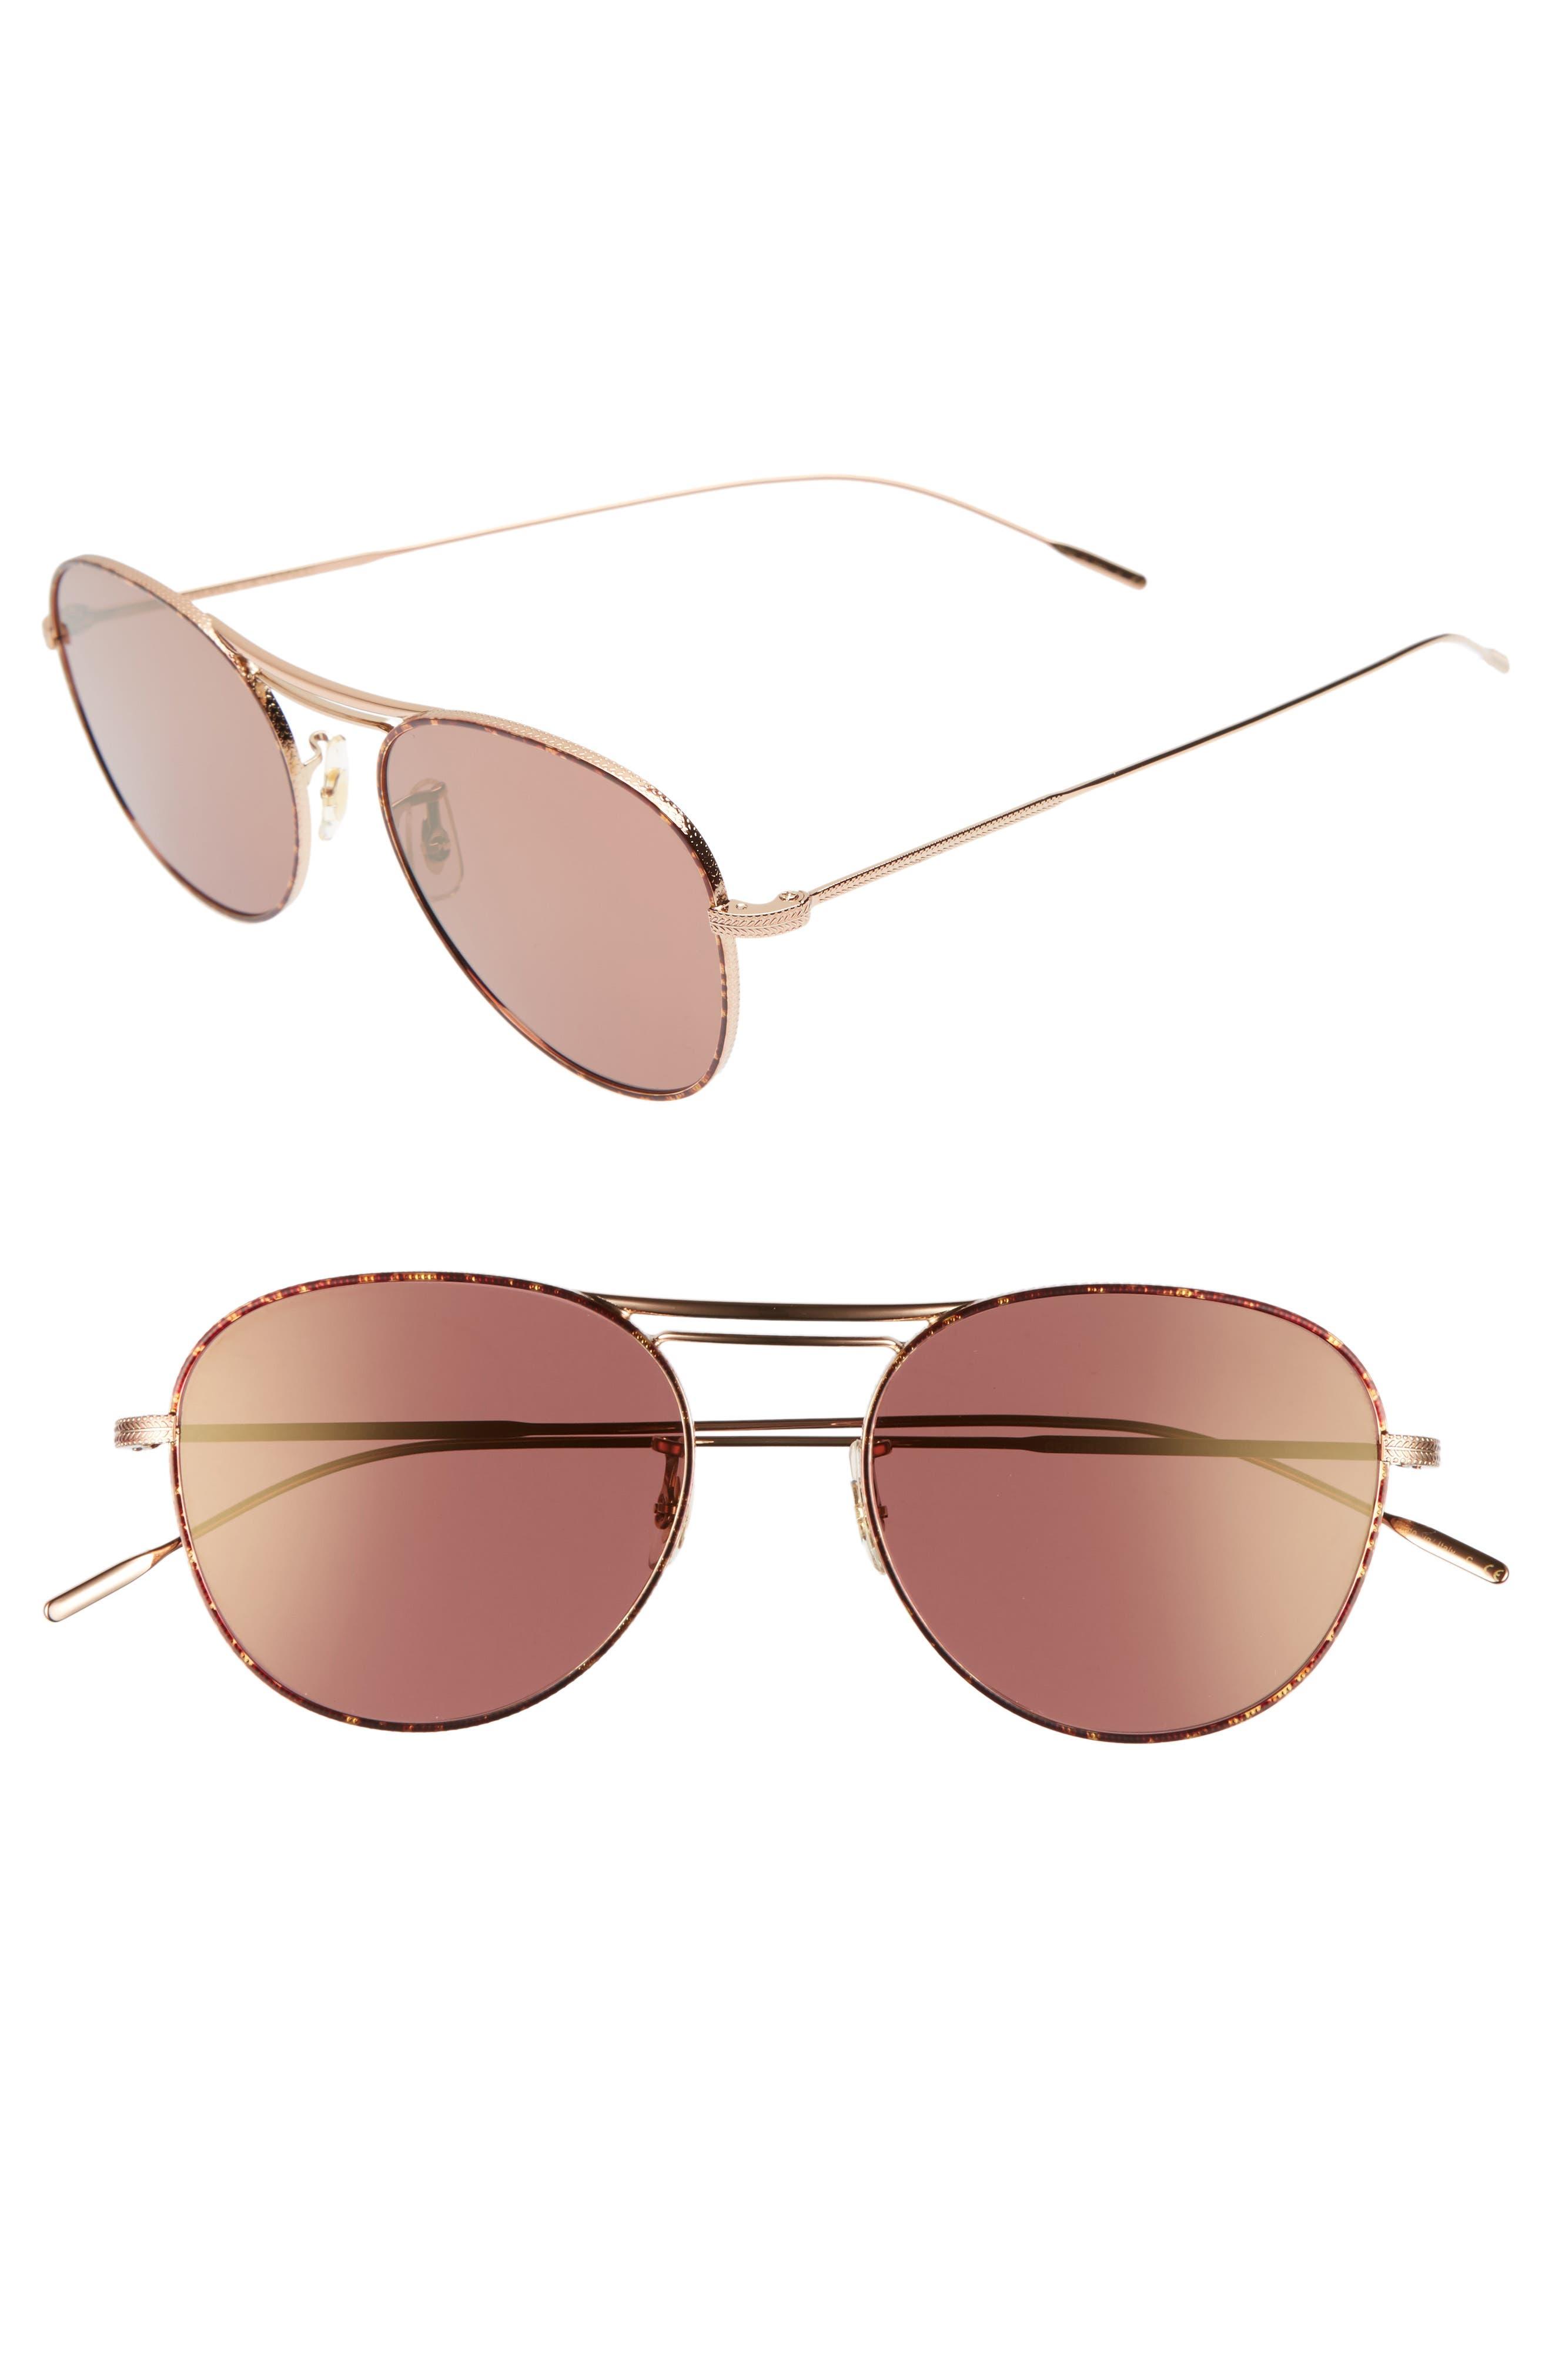 Cade 52mm Mirror Lens Aviator Sunglasses,                             Main thumbnail 1, color,                             Burgundy